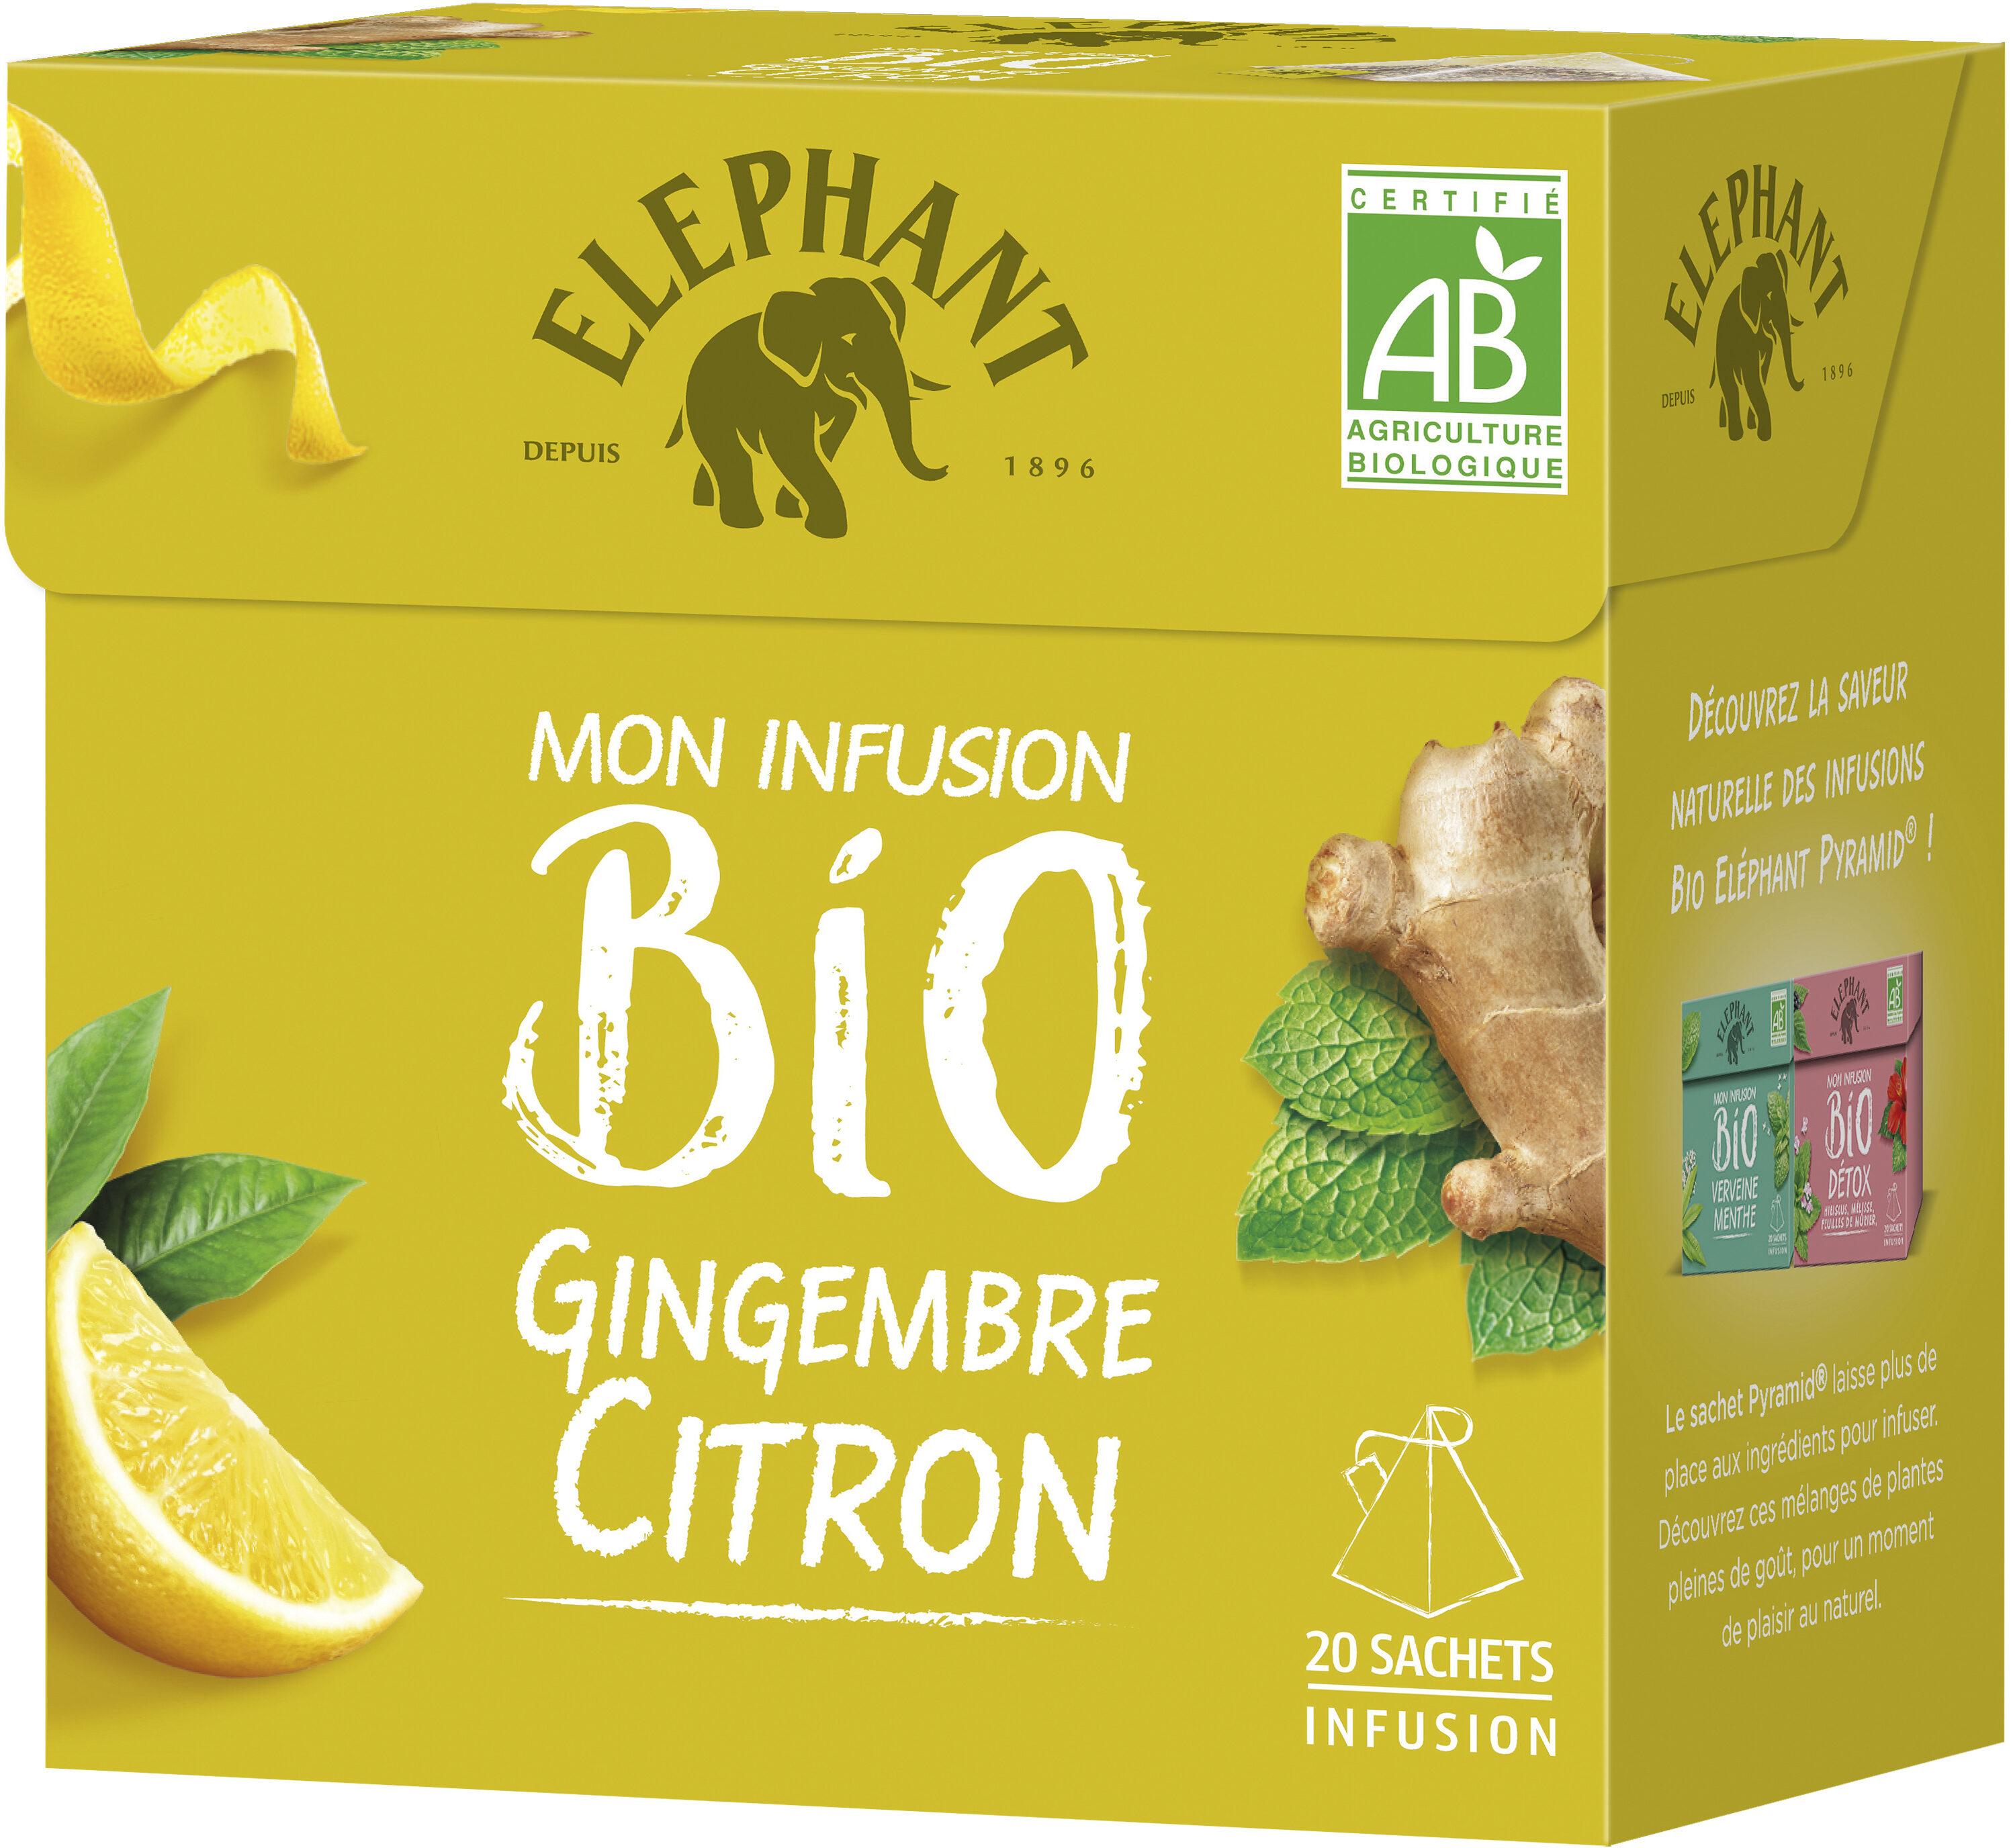 Elephant Infusion Gingembre Citron 20 Sachets - Product - fr